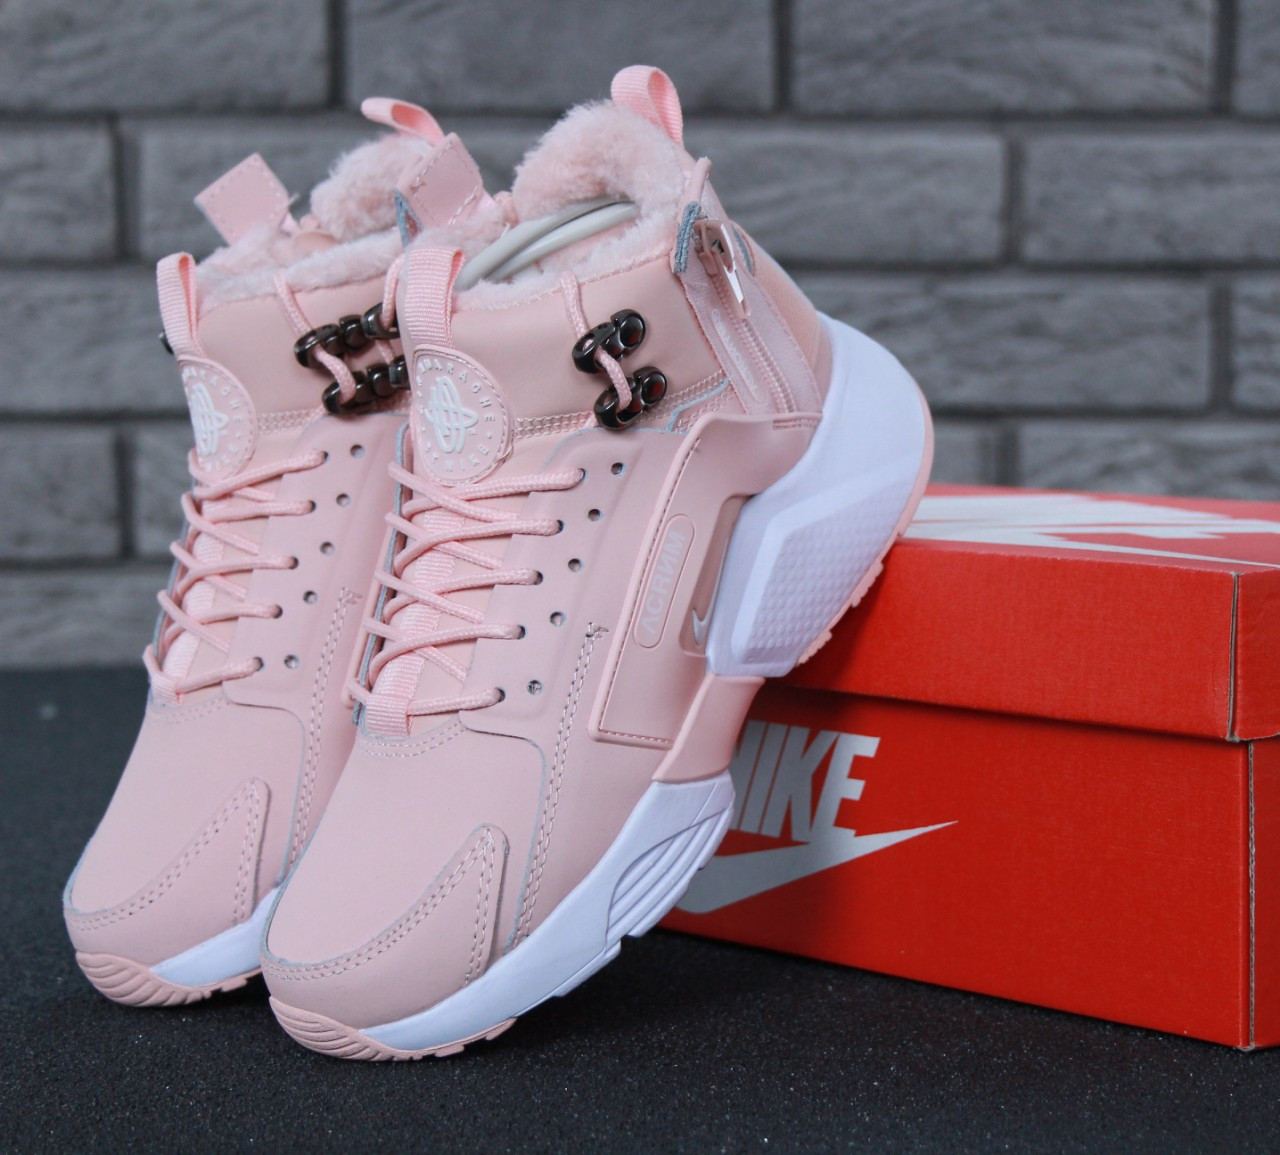 6a7f498b Женские Зимние Кроссовки Nike Huarache x Acronym City Winter Pink (Реплика  Люкс) - Магазин